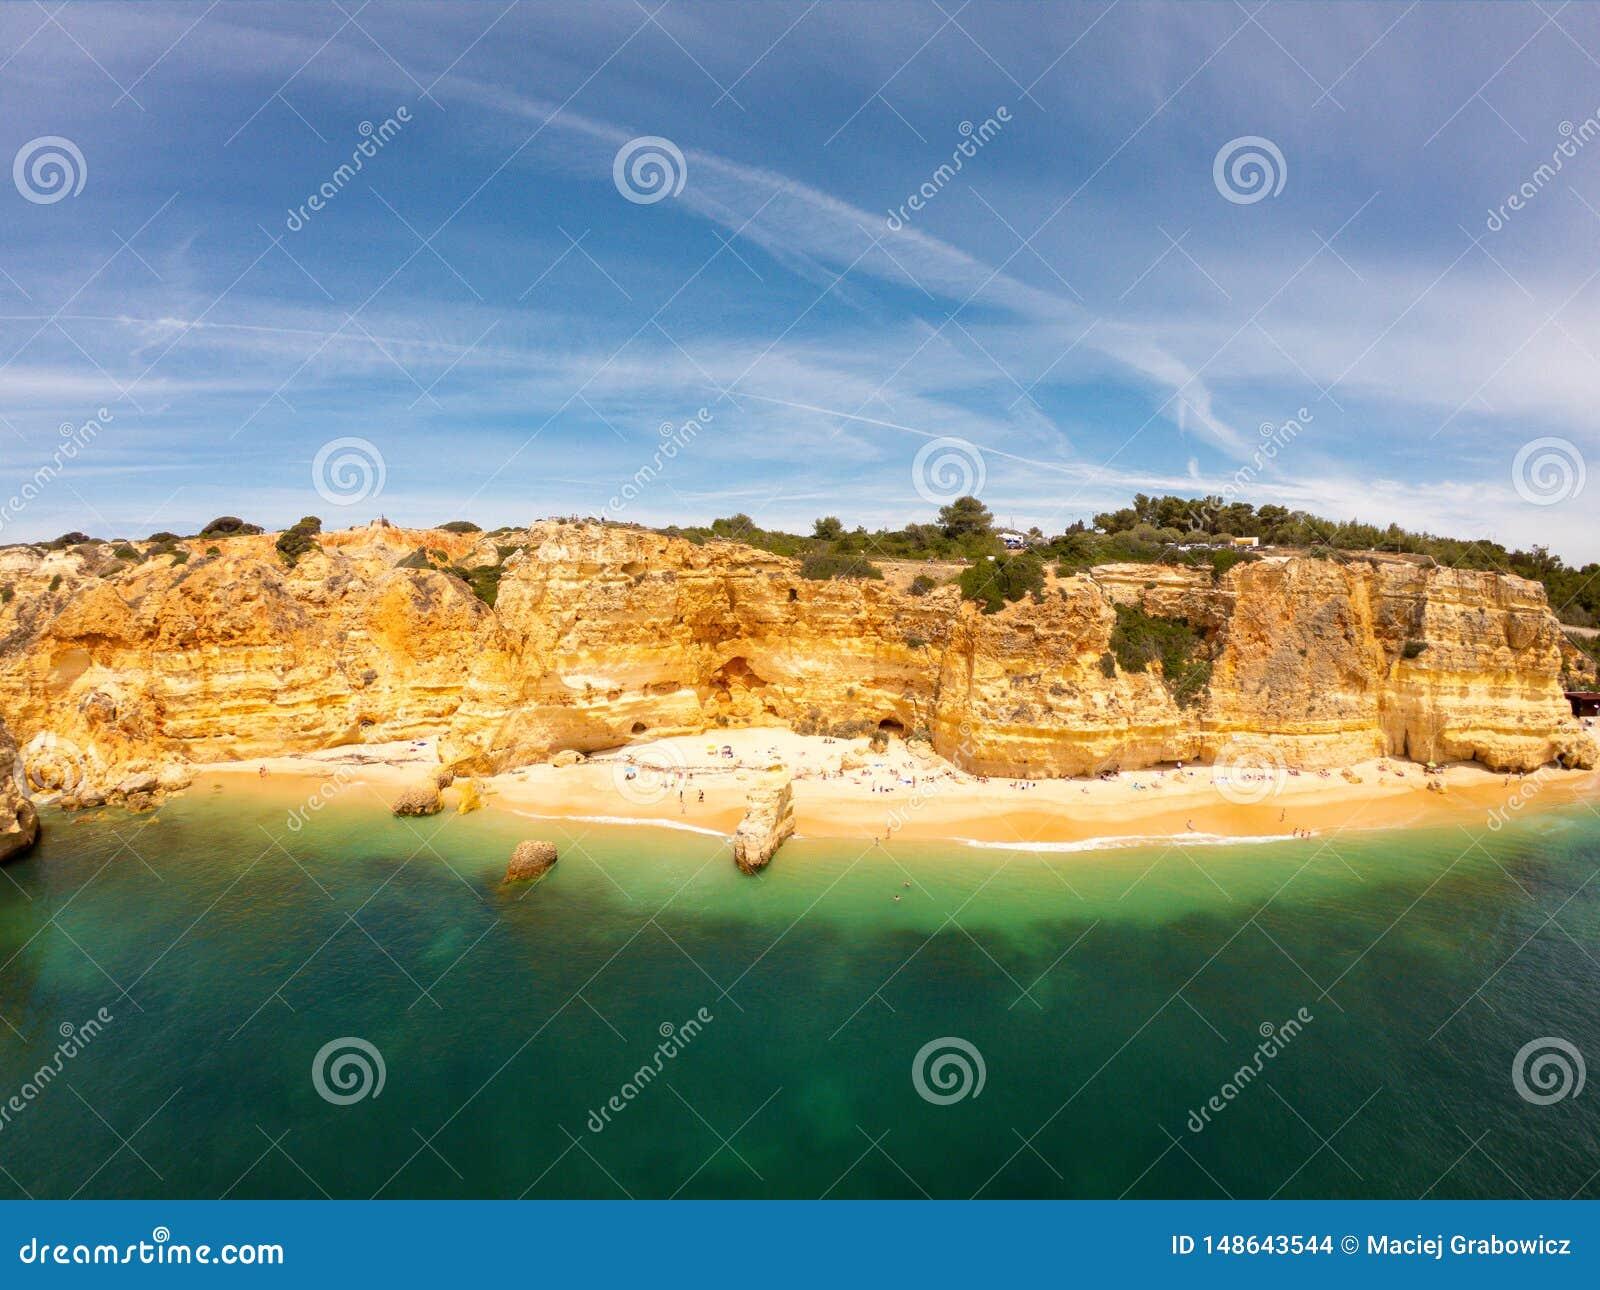 Praia DE Marinha Most mooi strand in Lagoa, Algarve Portugal Satellietbeeld op klippen en kust van de Atlantische Oceaan